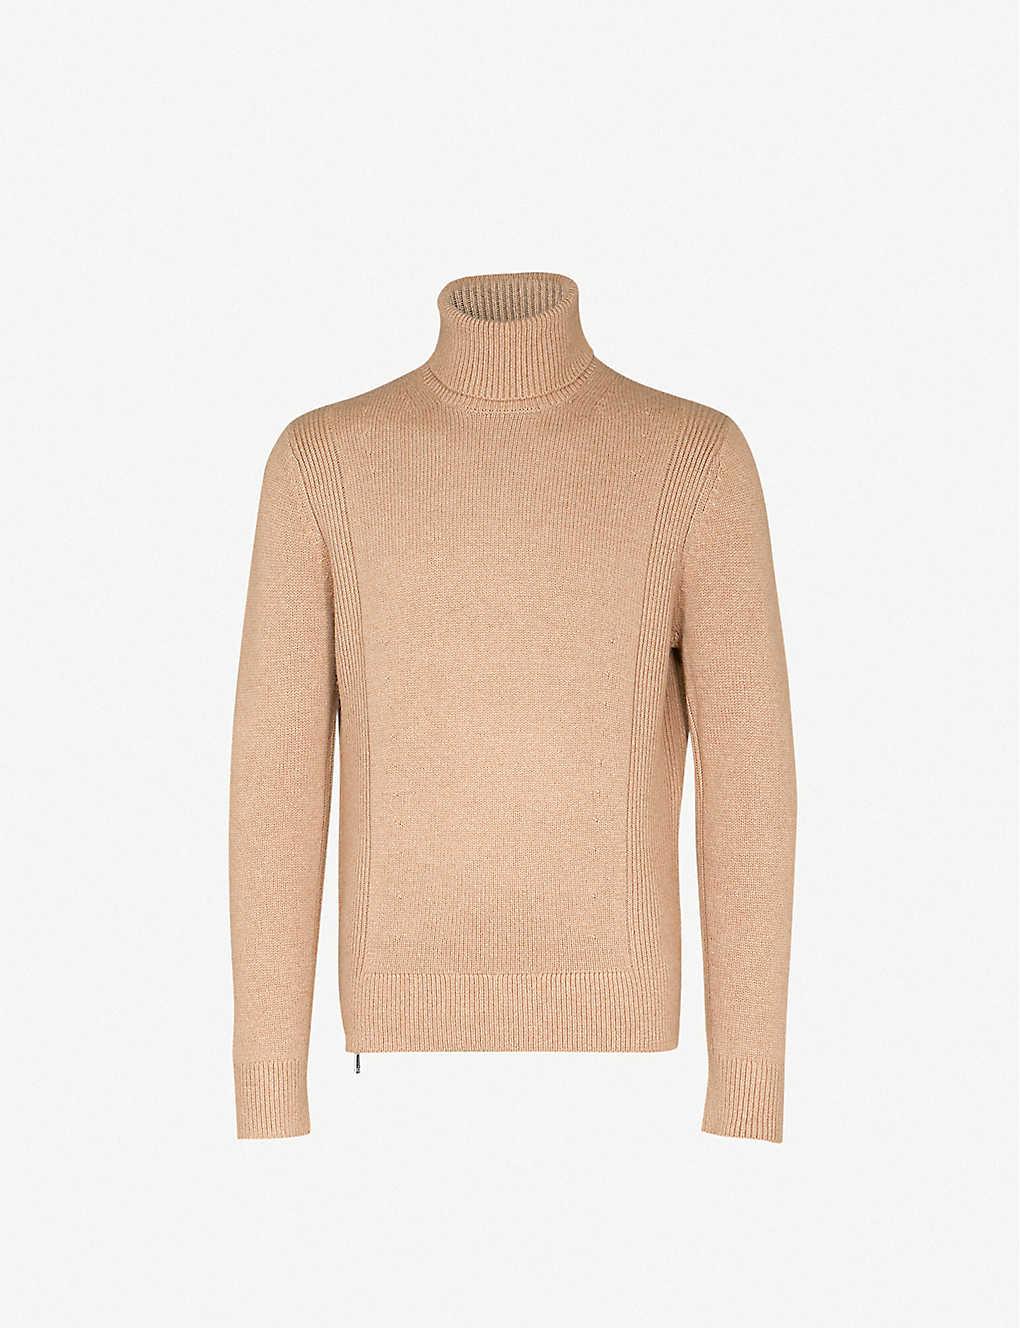 6e4dcced9 REISS - Ashbourne turtleneck waffle-knit sweater